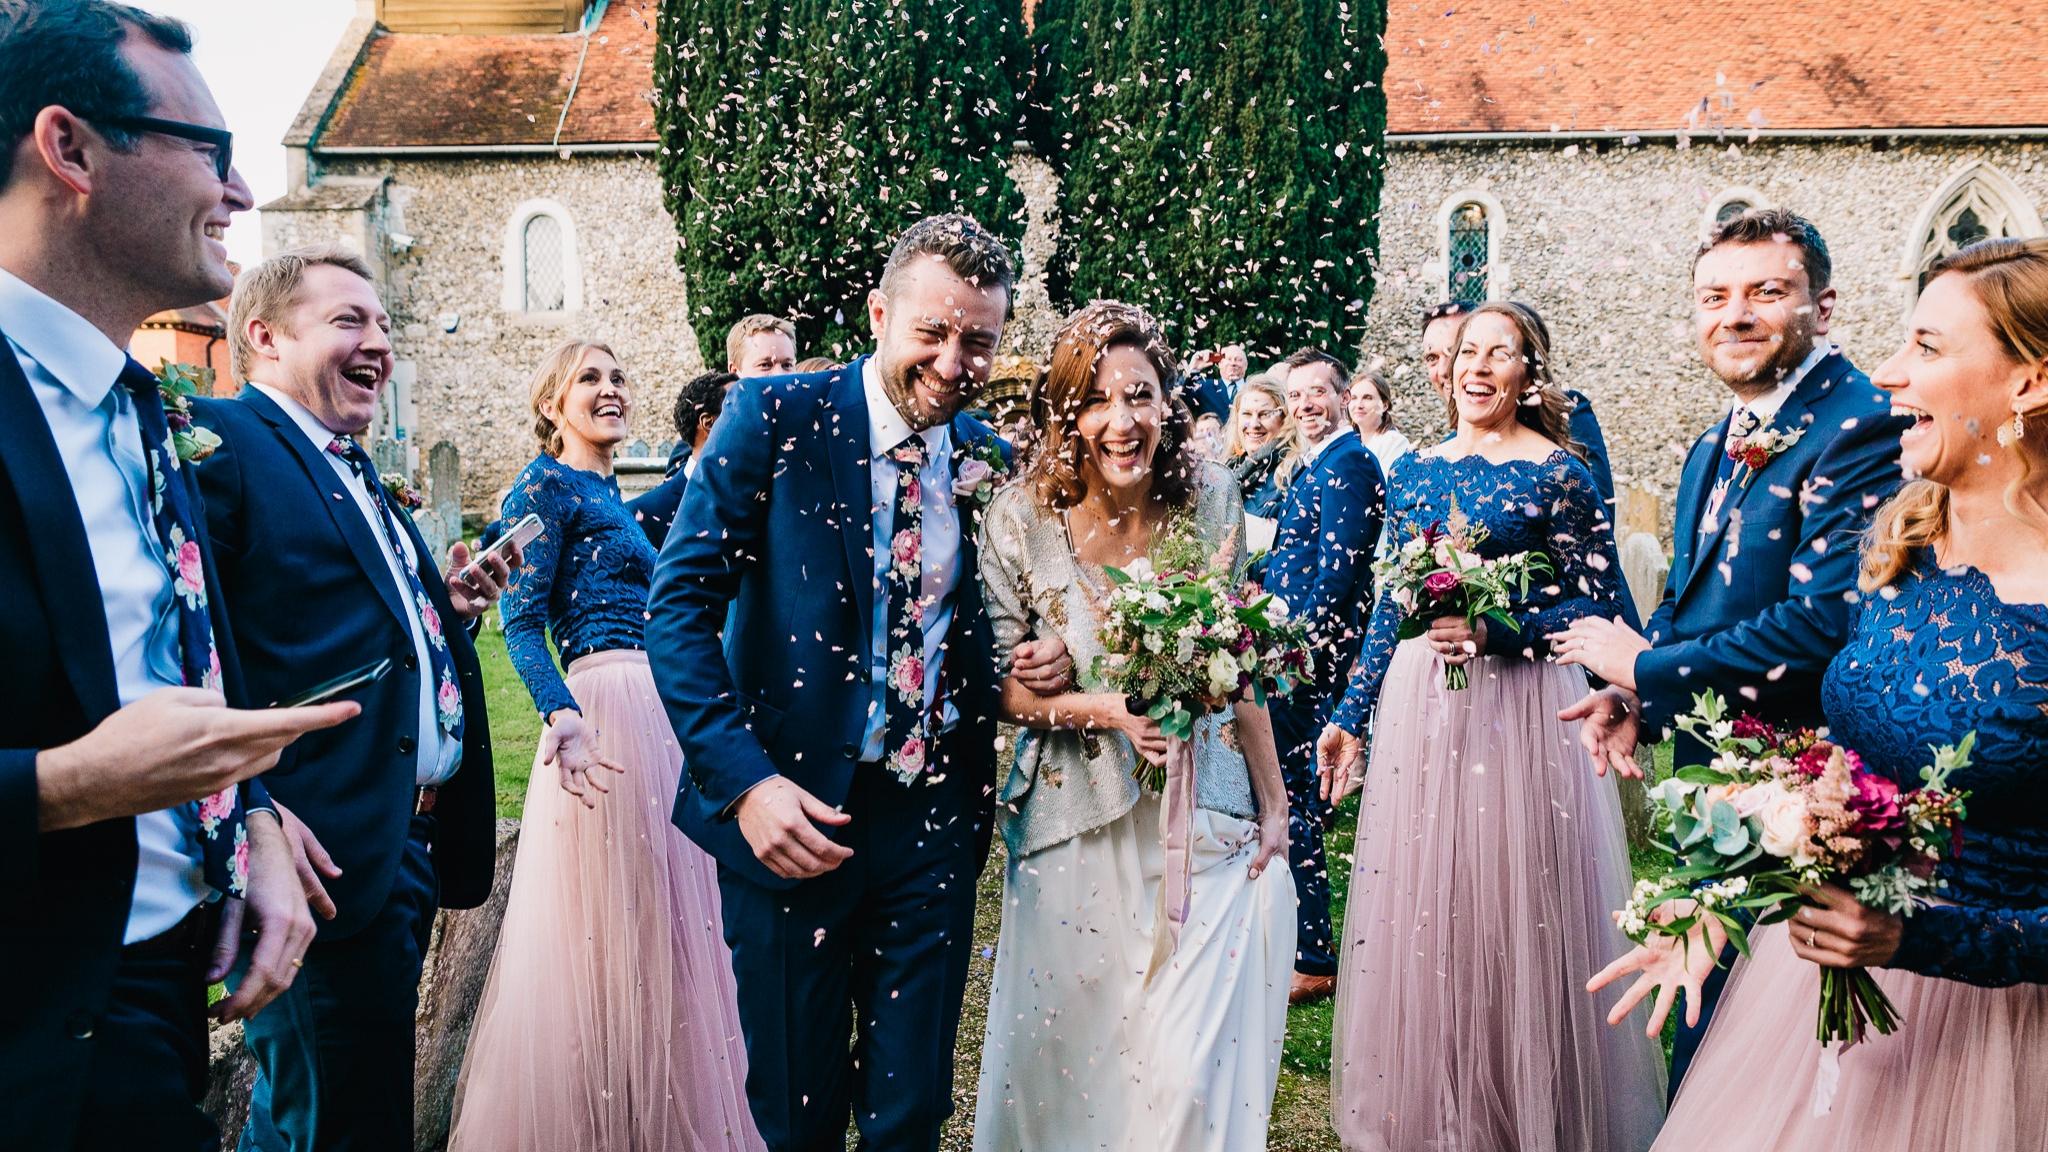 BRIDE AND GROOM WALKING THROUGH CONFETTI AT LONDON WEDDING